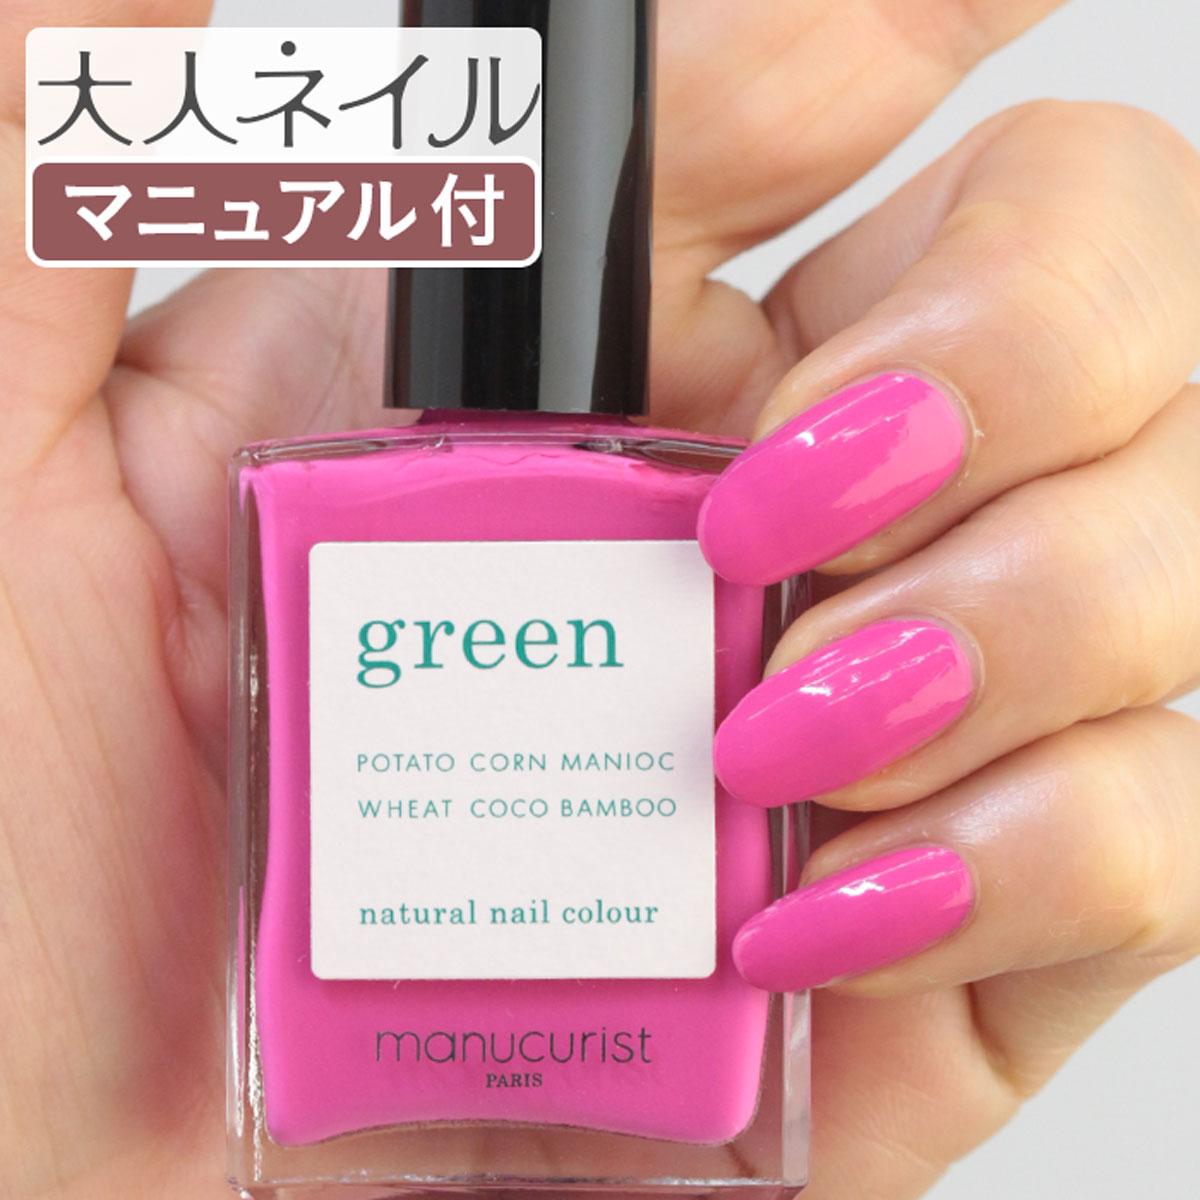 green グリーン ナチュラルネイルカラー ペチュラ 31057 15ml 爪にやさしい マニキュア セルフネイル 濃い ピンク 夏カラー 夏ネイル ペディキュア 女子会